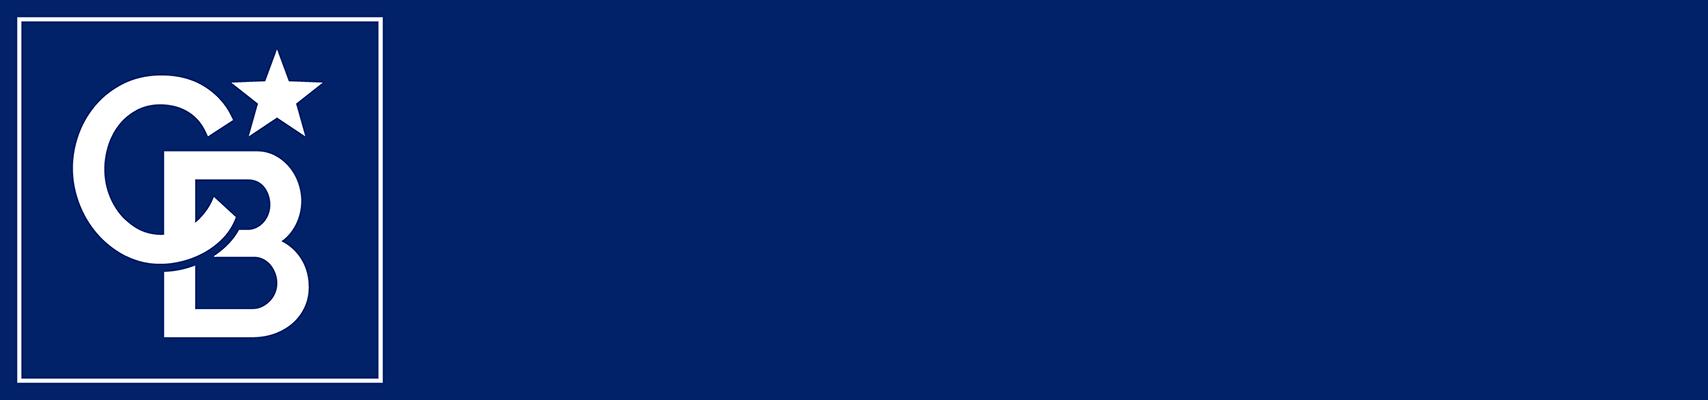 Coldwell Banker Advantage Logo